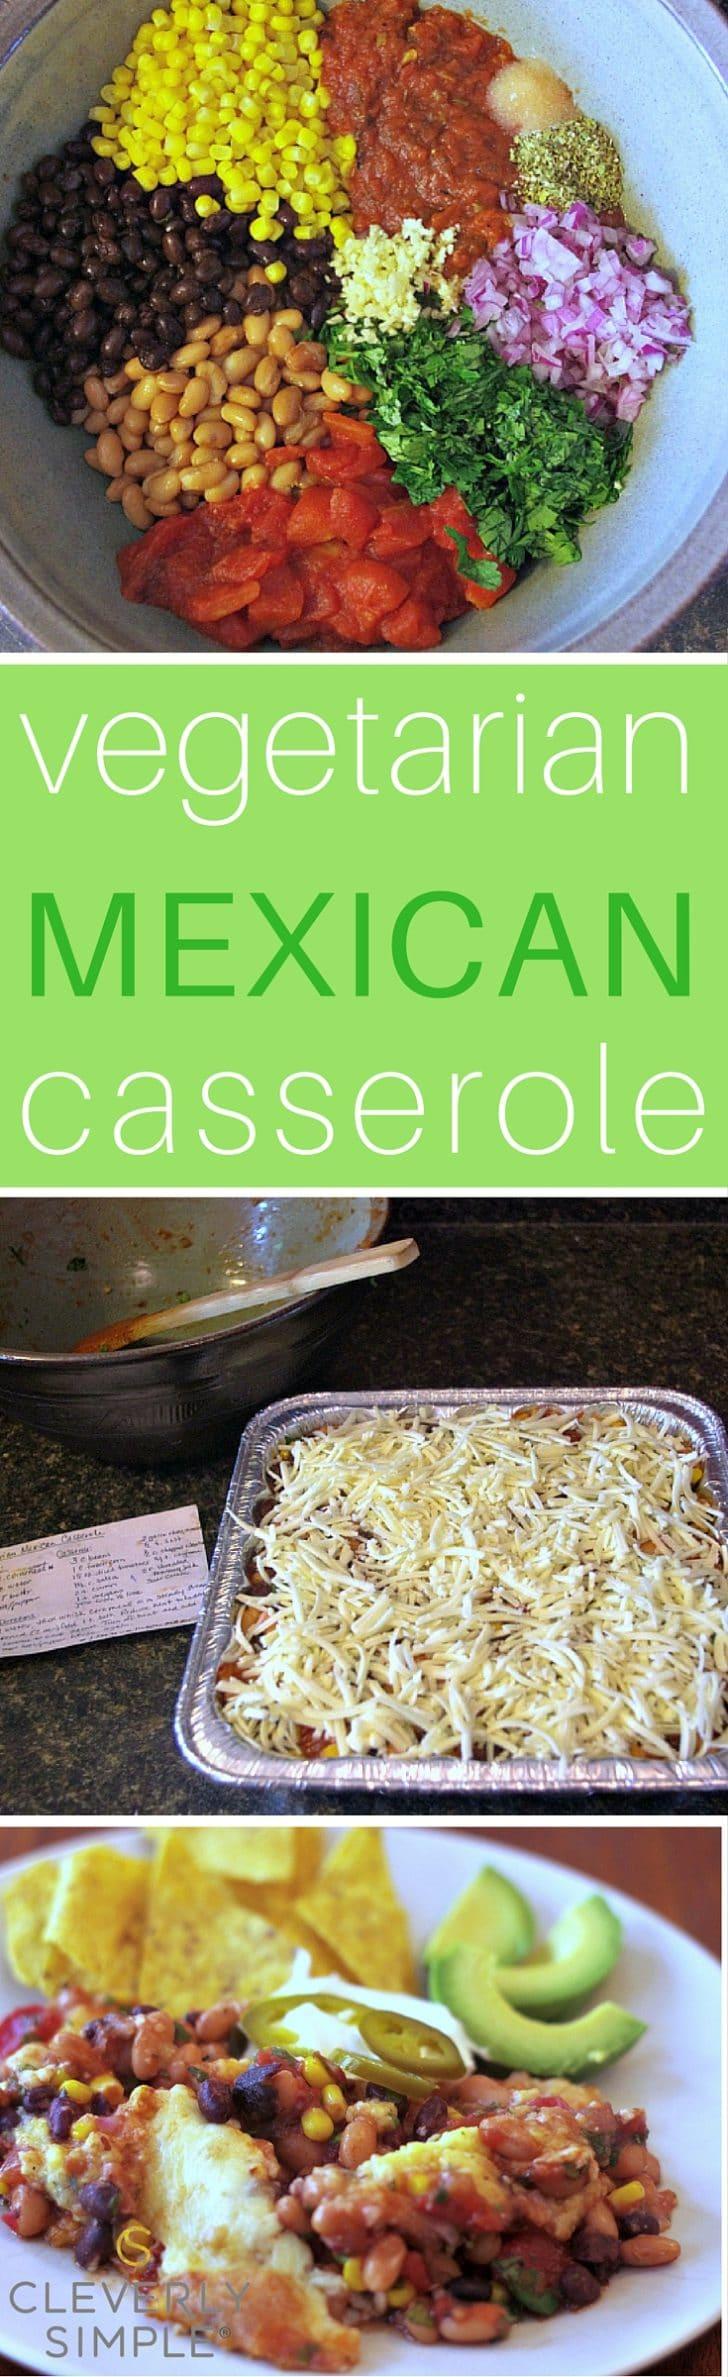 Vegetarian Mexican Casserole Freezer Friendly Cleverly